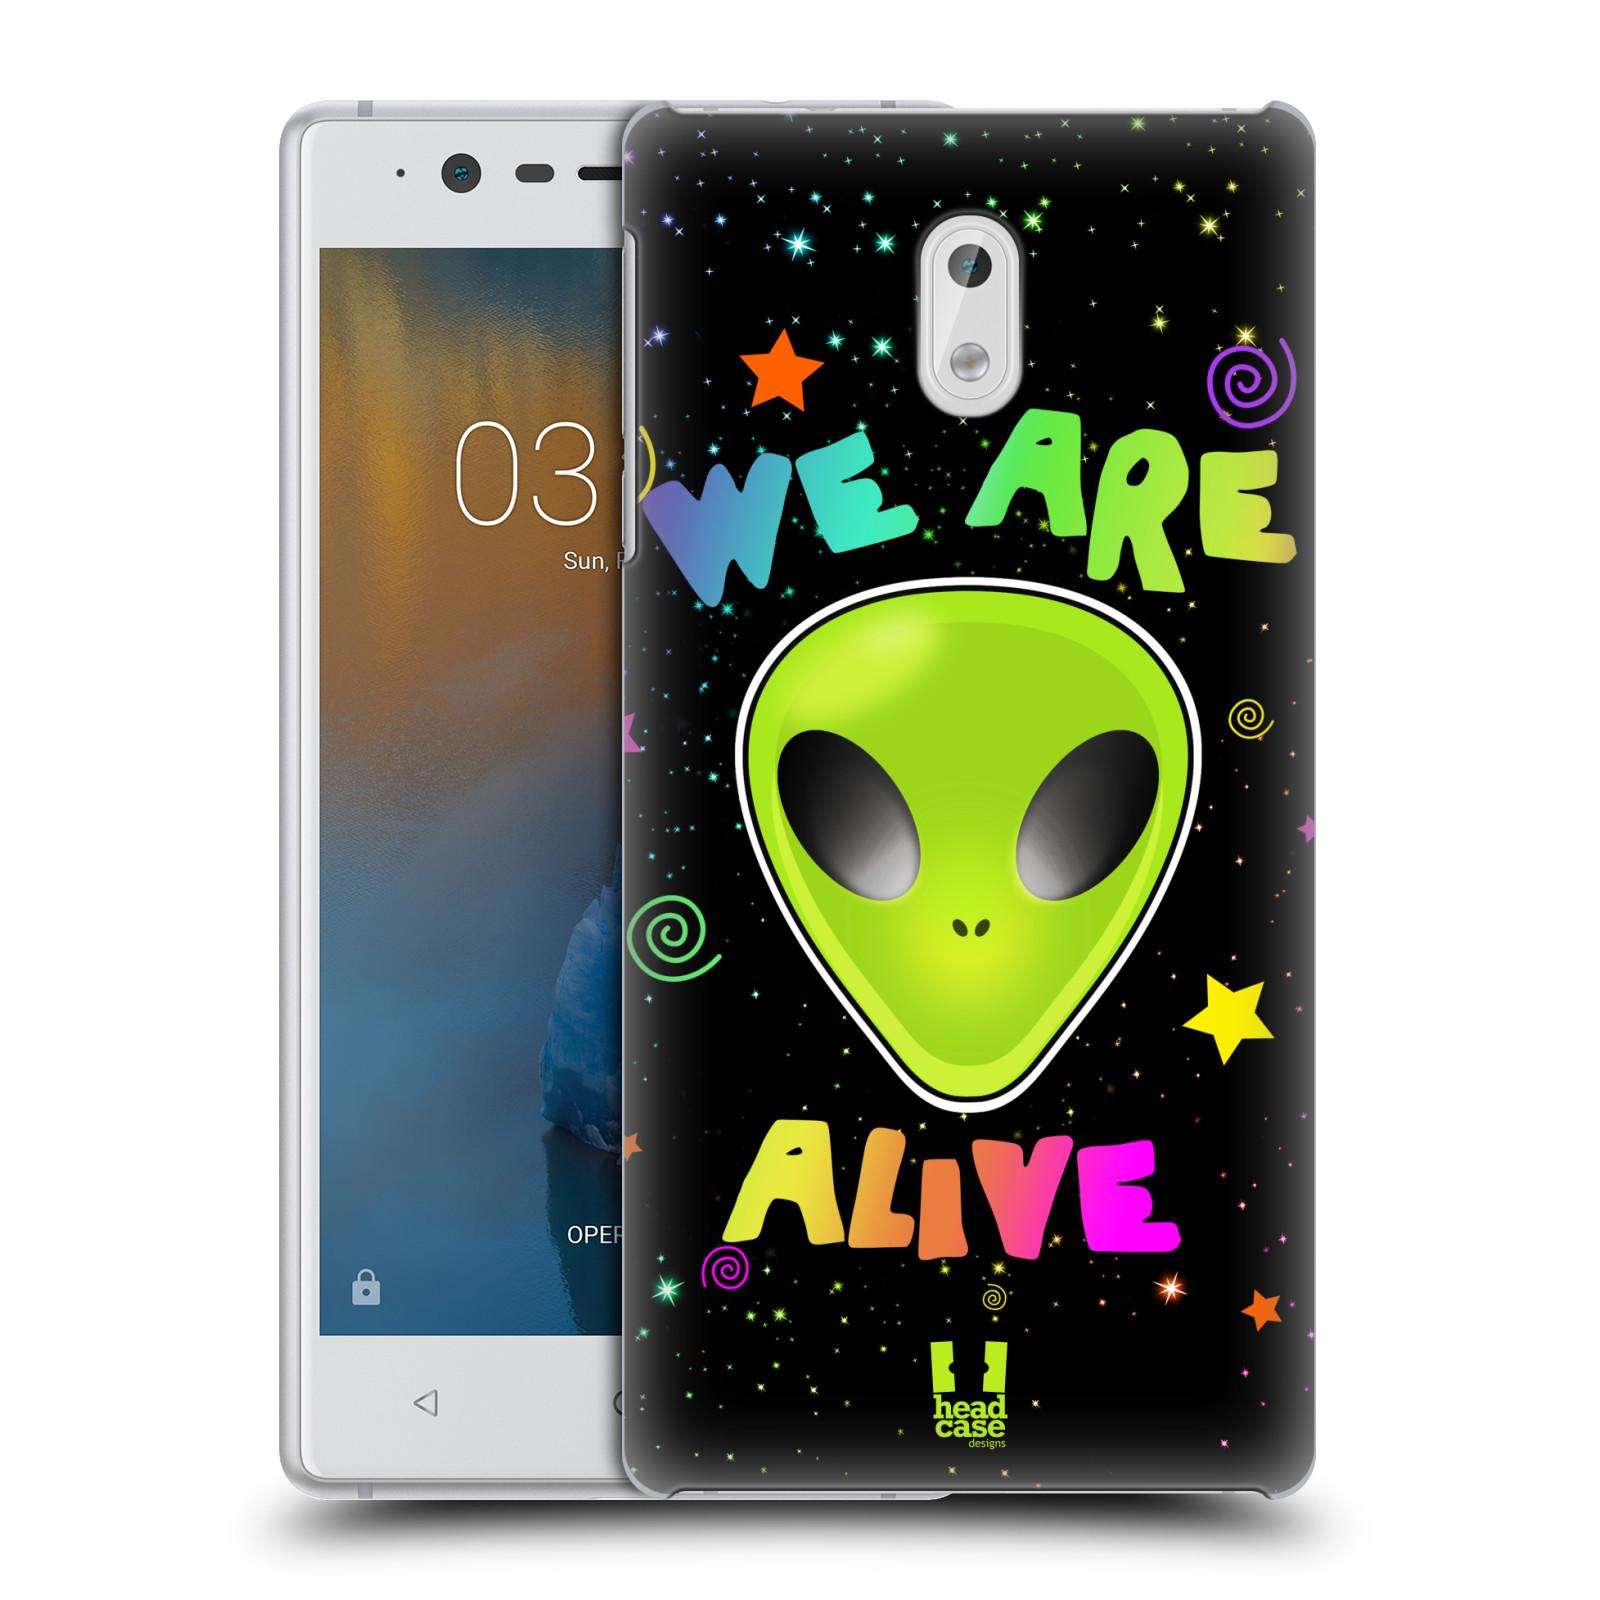 Plastové pouzdro na mobil Nokia 3 Head Case - ALIENS ALIVE